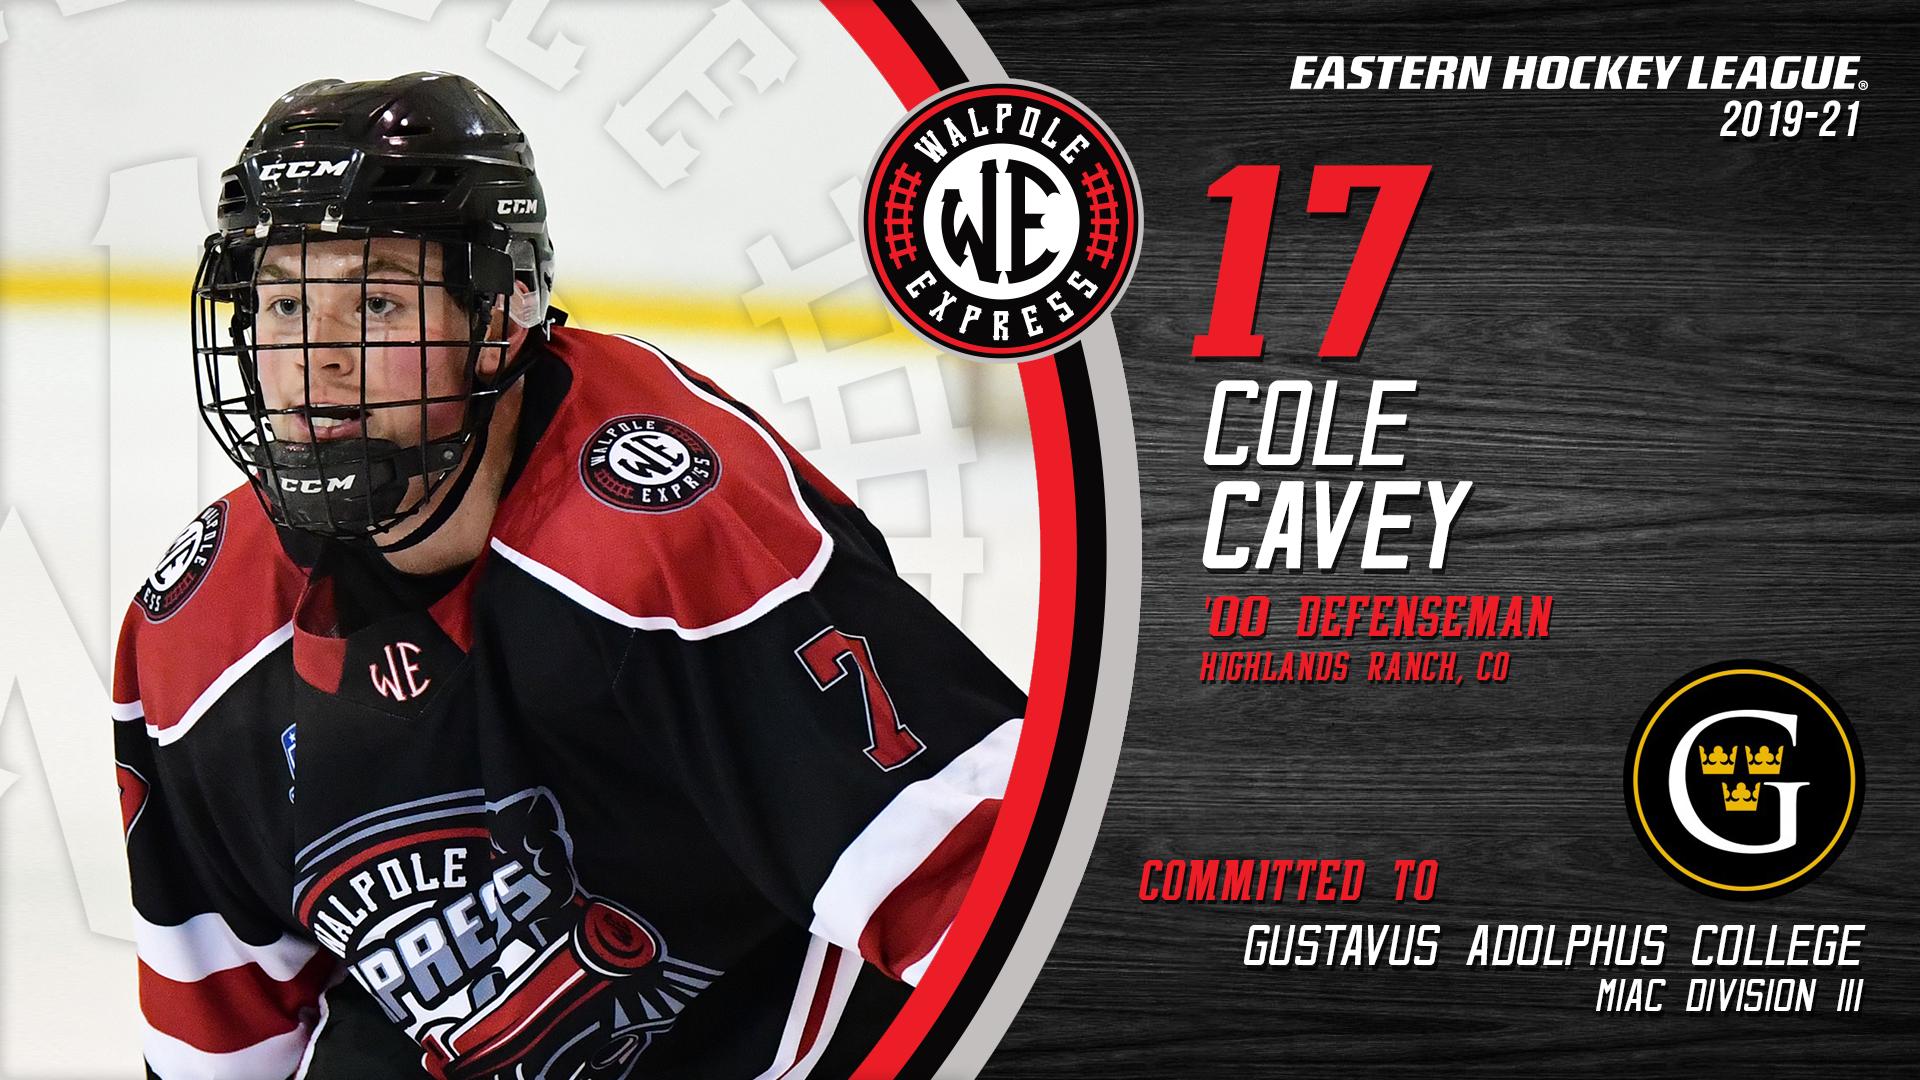 Cole Cavey